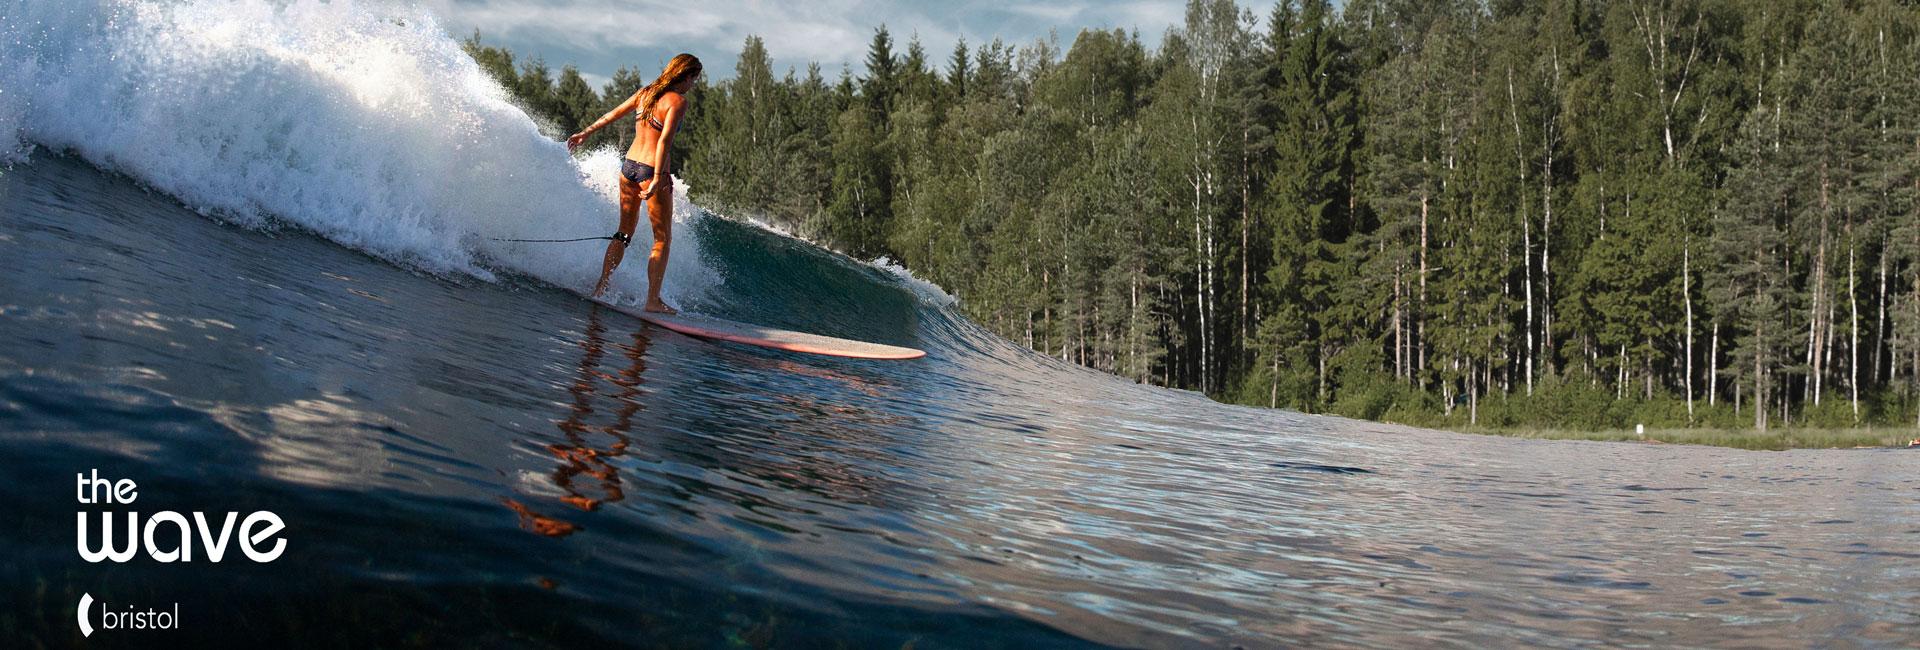 w-l_hm-sldr_surf-girl-bristol_1920x650